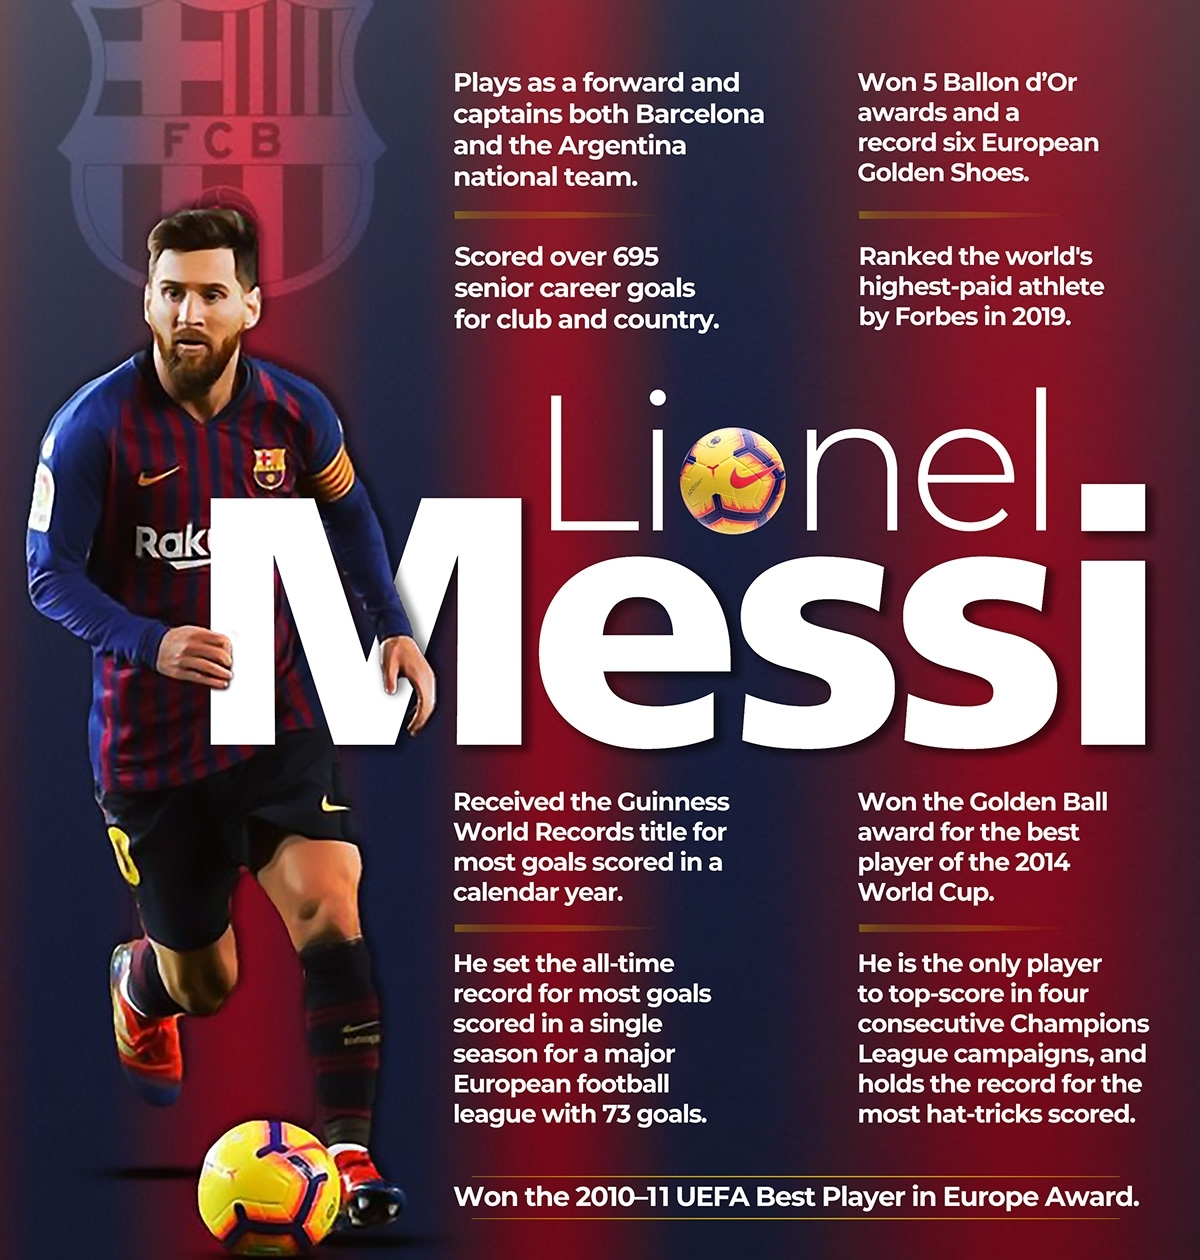 Lionel Messi On Behance